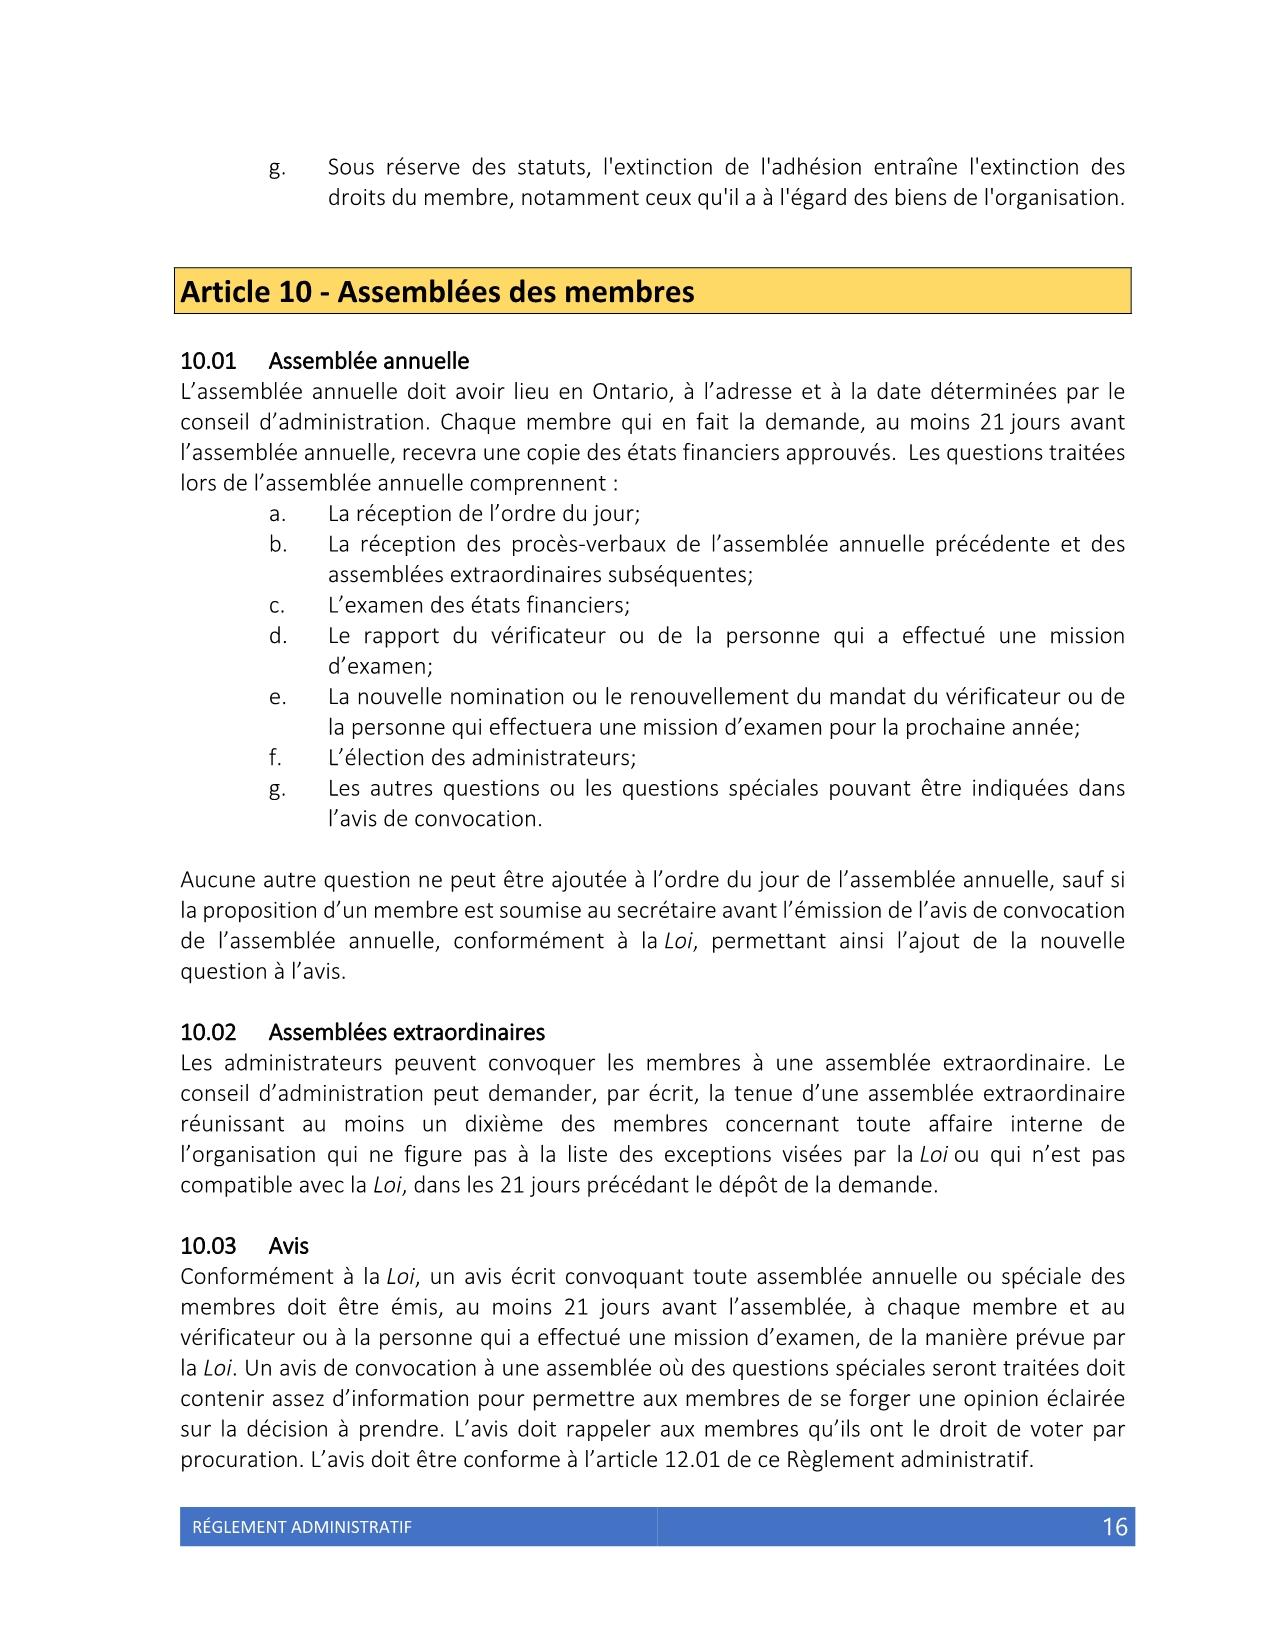 Reglementadministratif_c0259d571bcc445b9